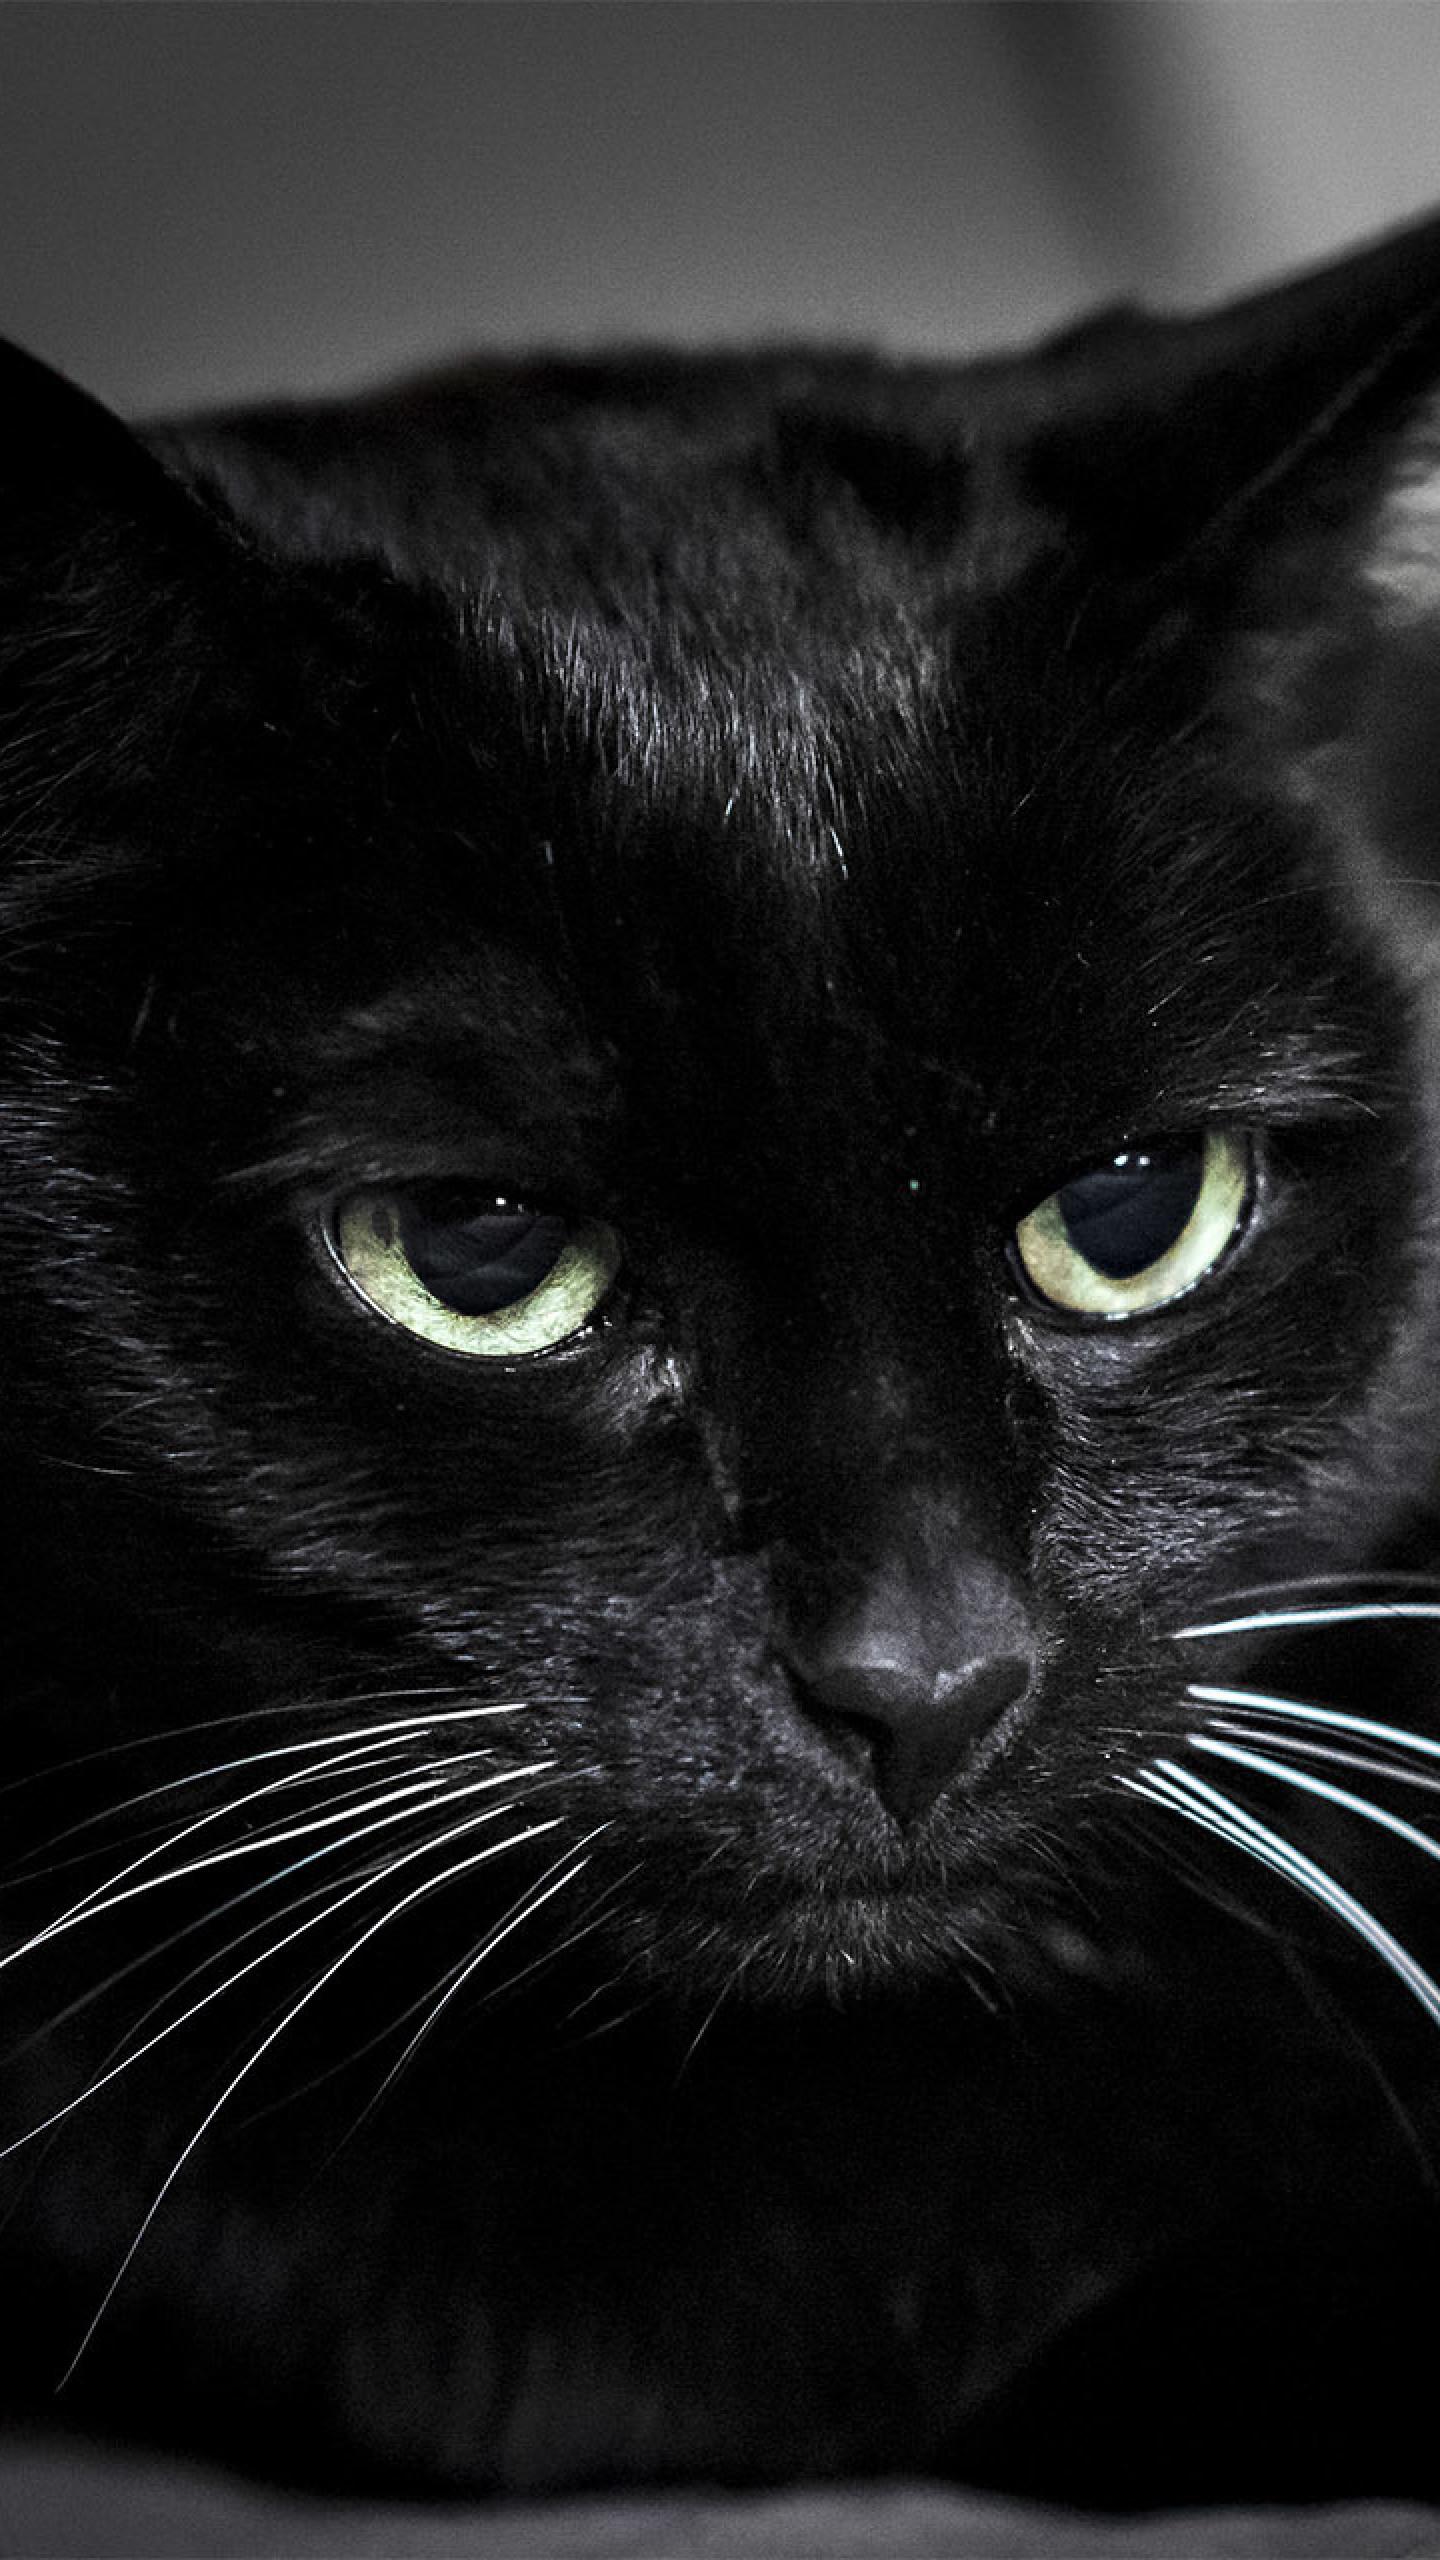 Preview Wallpaper Black Cat Muzzle Eyes Data Src Cat Wallpaper Hd Black 1440x2560 Wallpaper Teahub Io